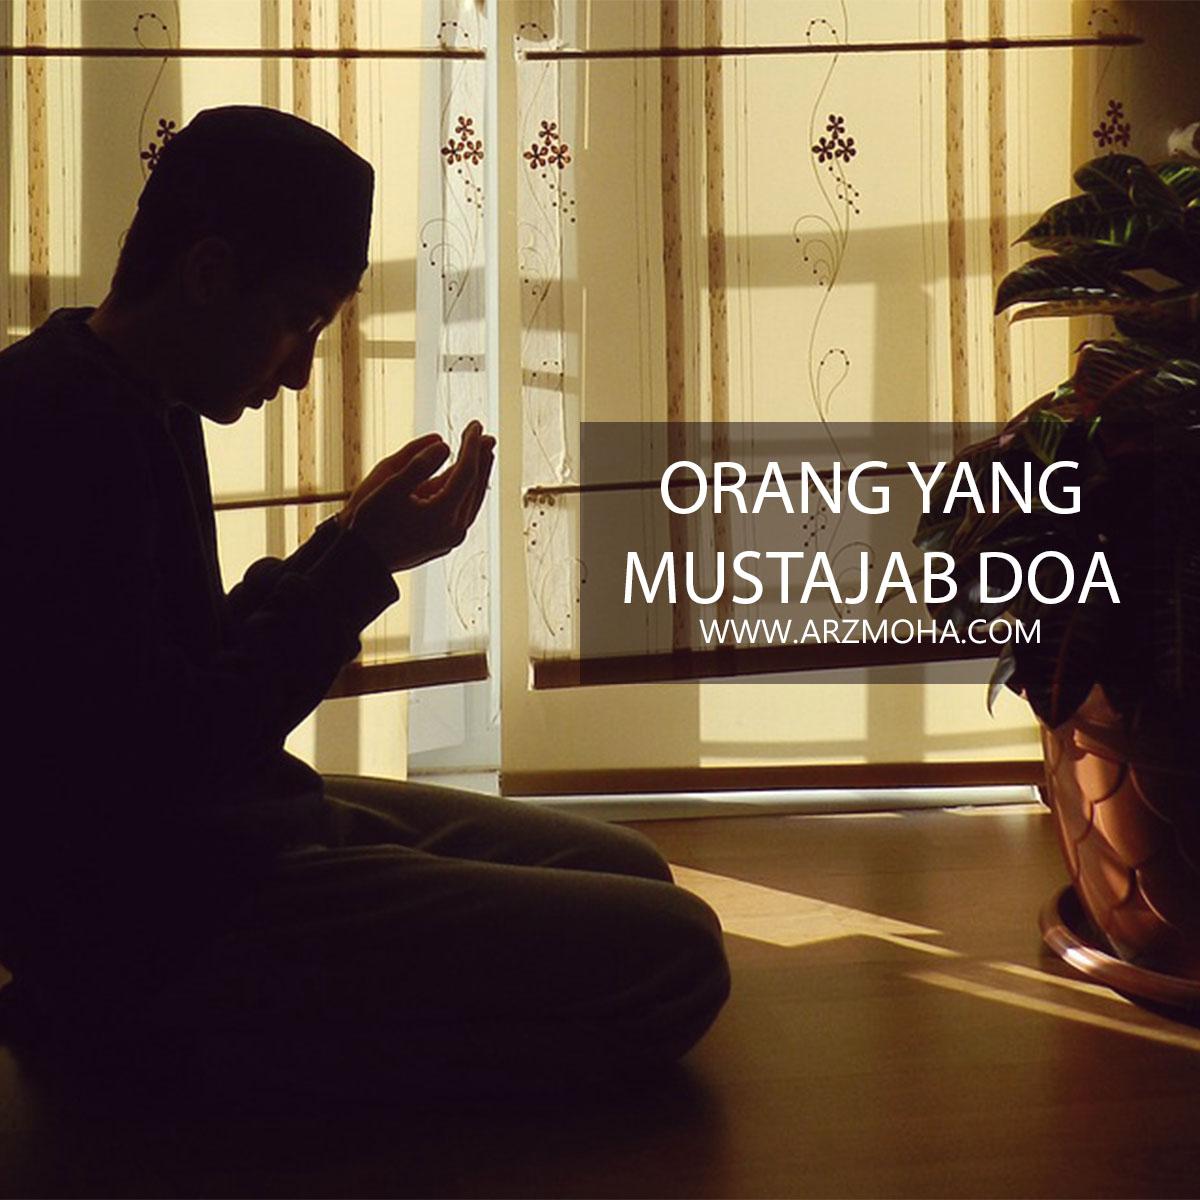 Mustajab Doa 1 | Orang Yang Mustajab Doa